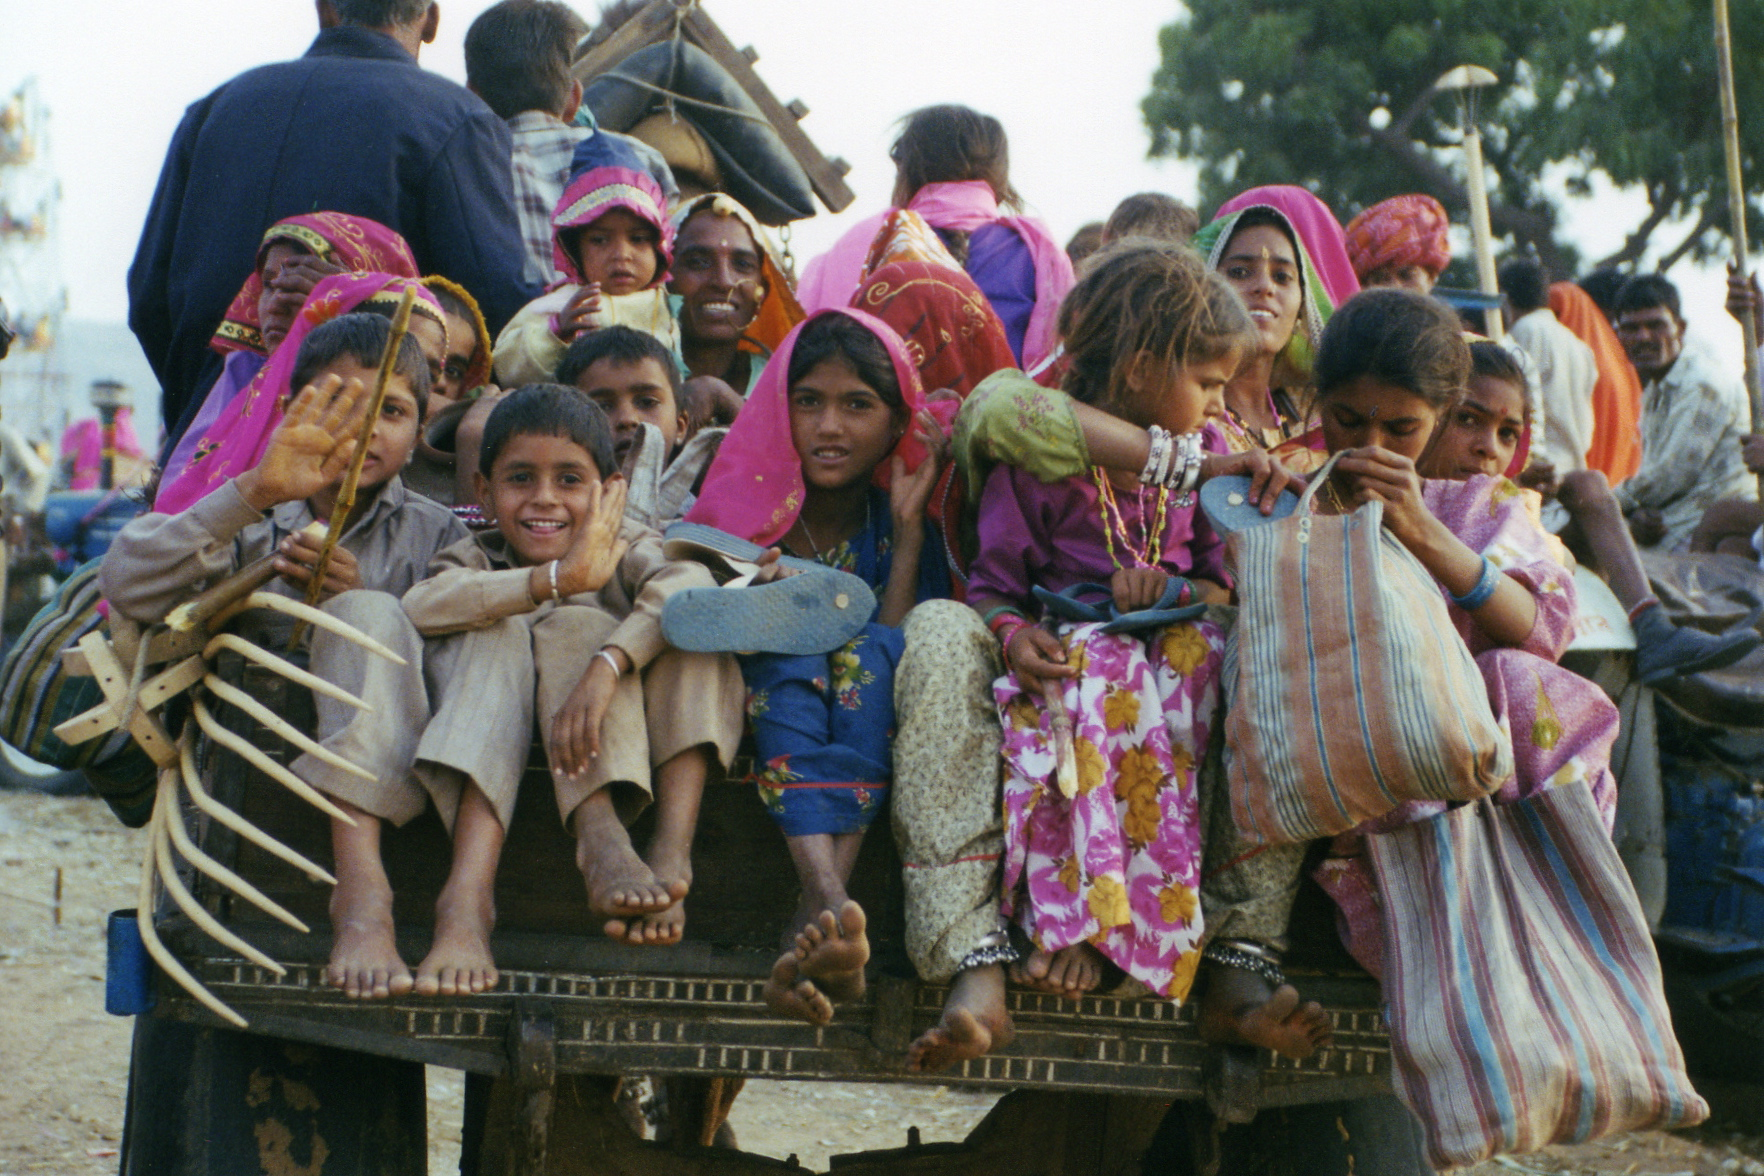 1999 Rajasthan, India